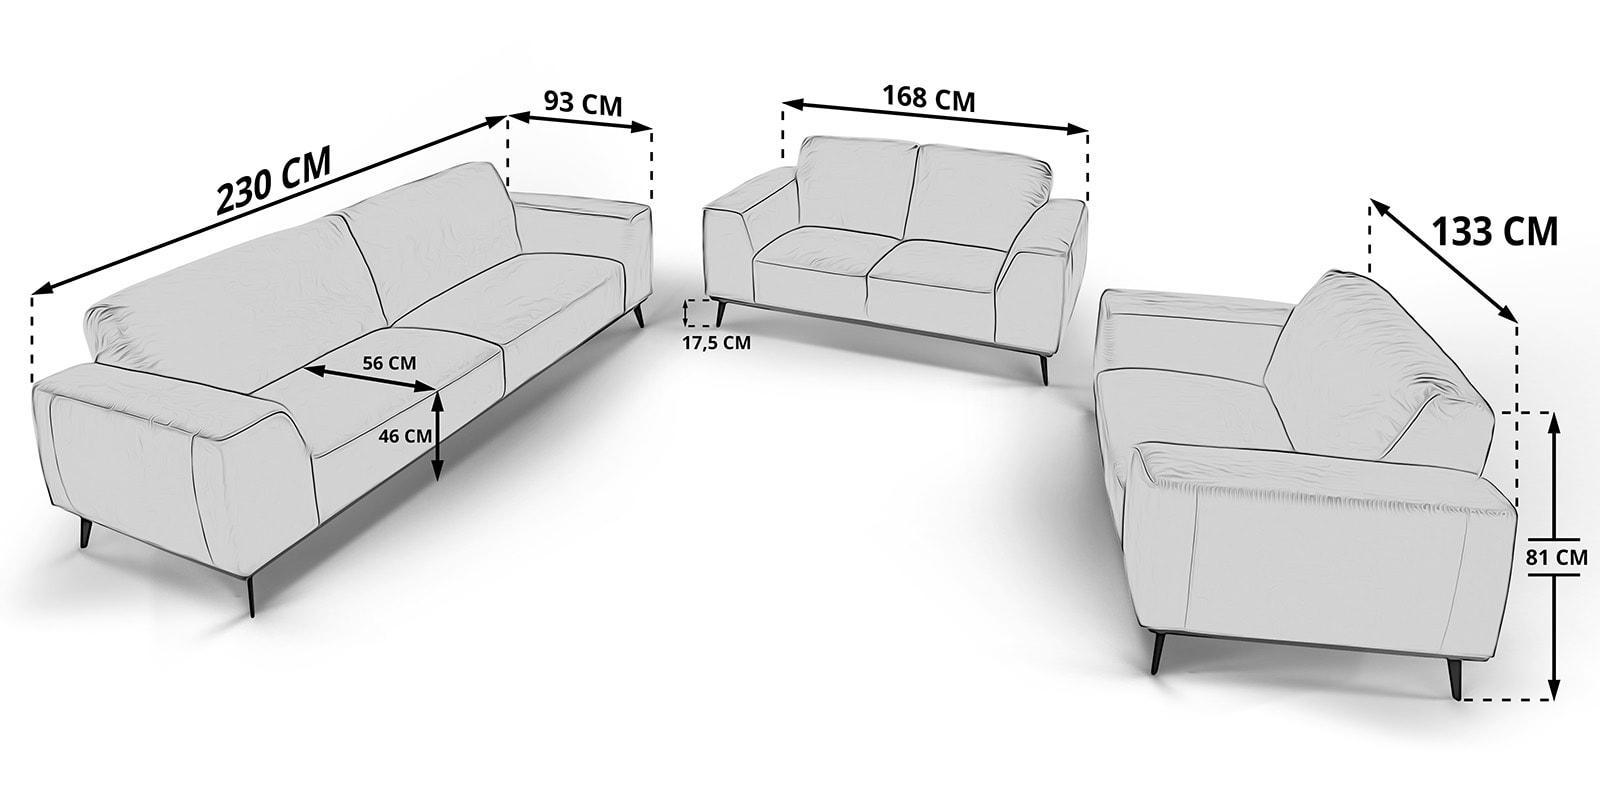 Moebella24 - 3-2-1-Sitzer - Sofa - Barcelona - Skizze - Maße - Samt - Skandinavisches - Design - Punto - cavallo - Nähte